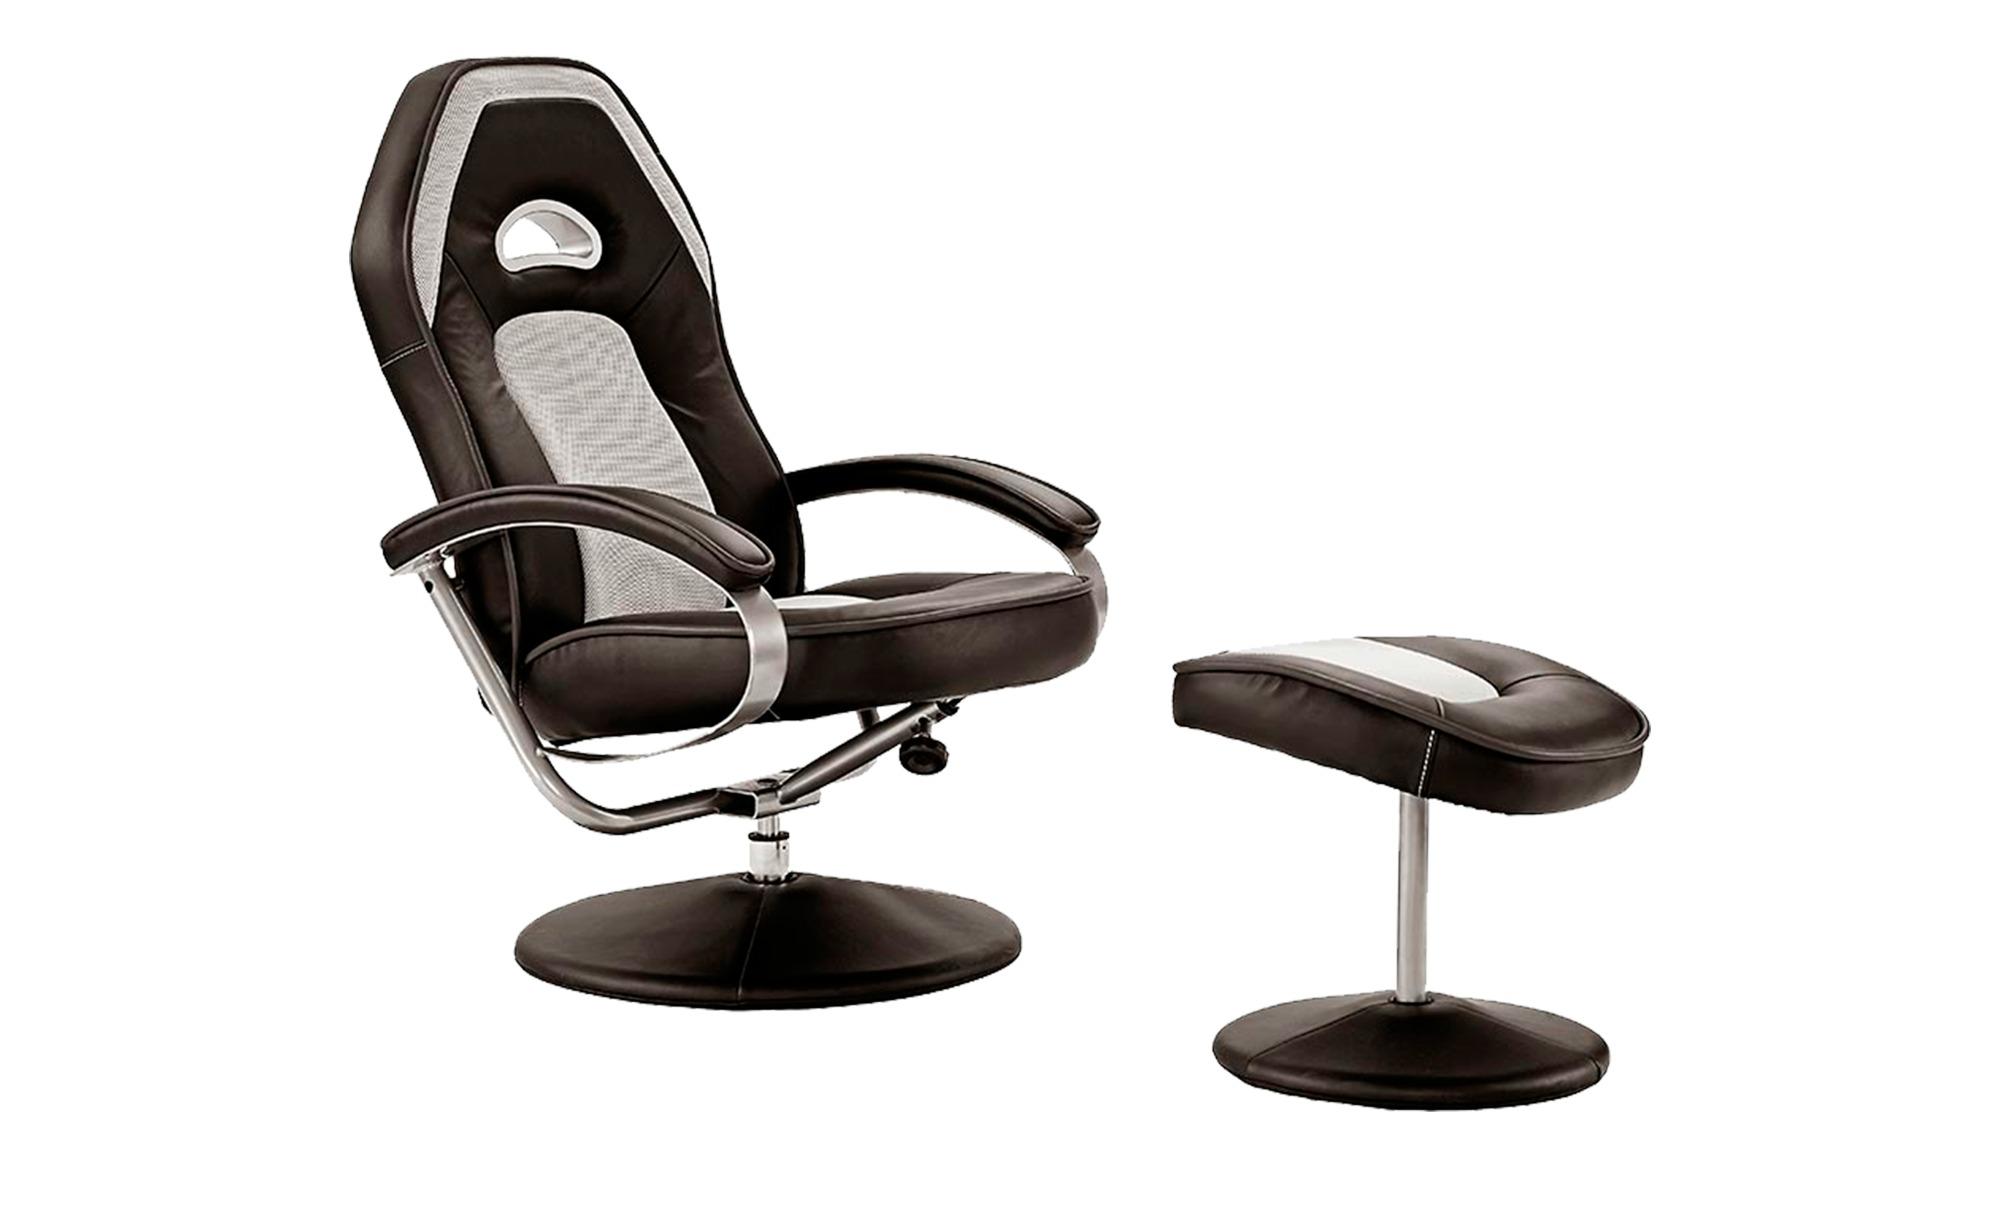 Relaxsessel  Jutta ¦ schwarz ¦ Maße (cm): B: 70 H: 105 T: 81 Polstermöbel > Sessel > Fernsehsessel - Höffner